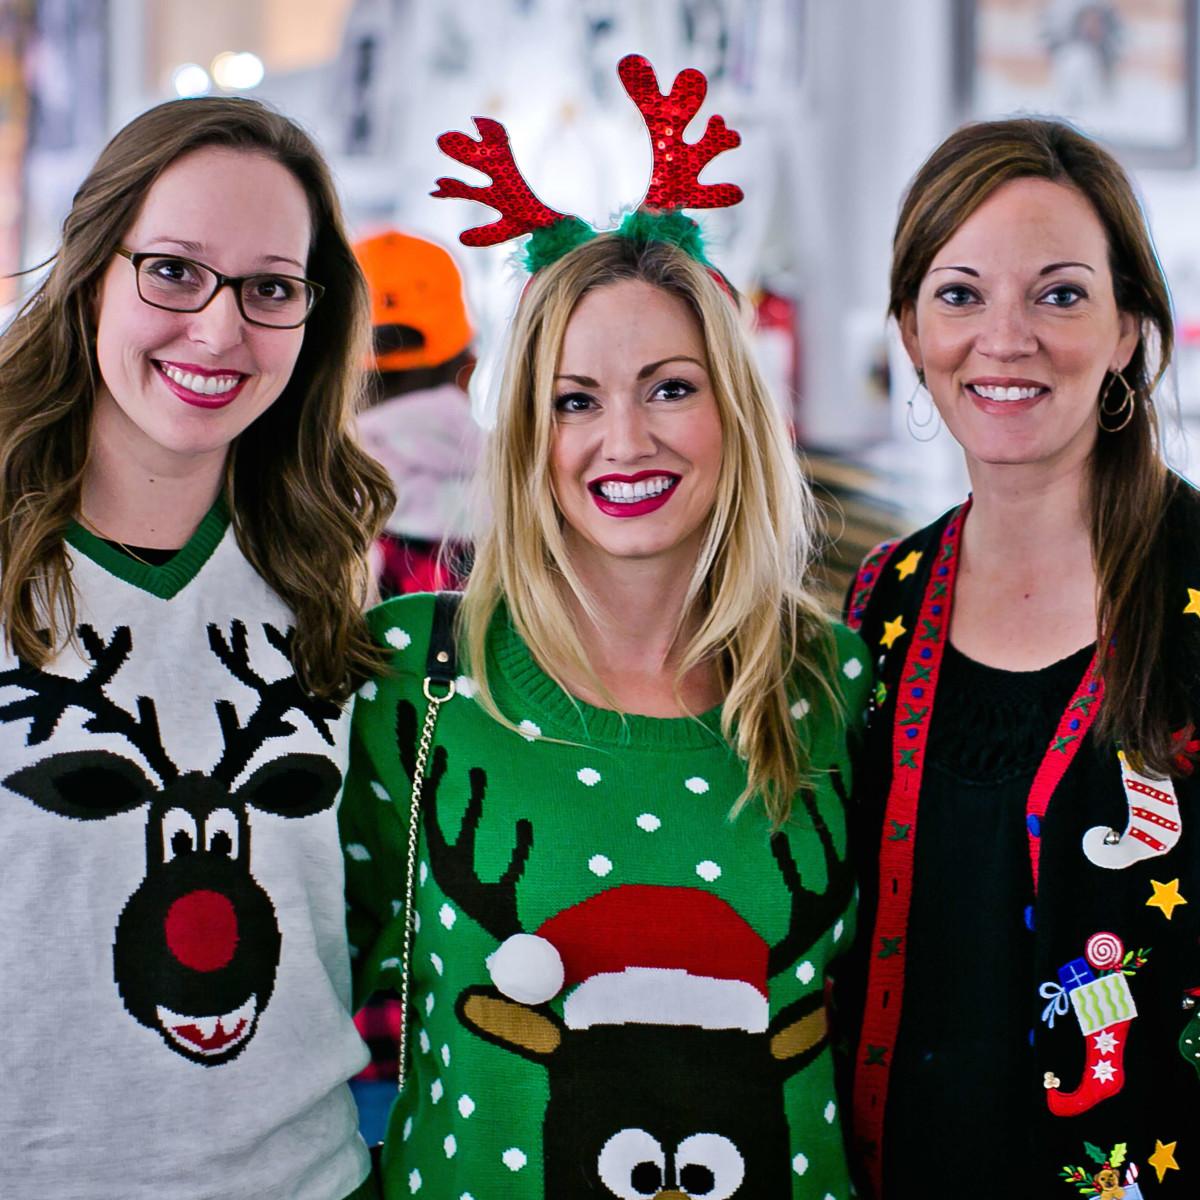 Houston, Fresh Arts Winter Holiday Art Market, Nov 2016, Samantha Smith, Frances Hamker, Carrie Cherek